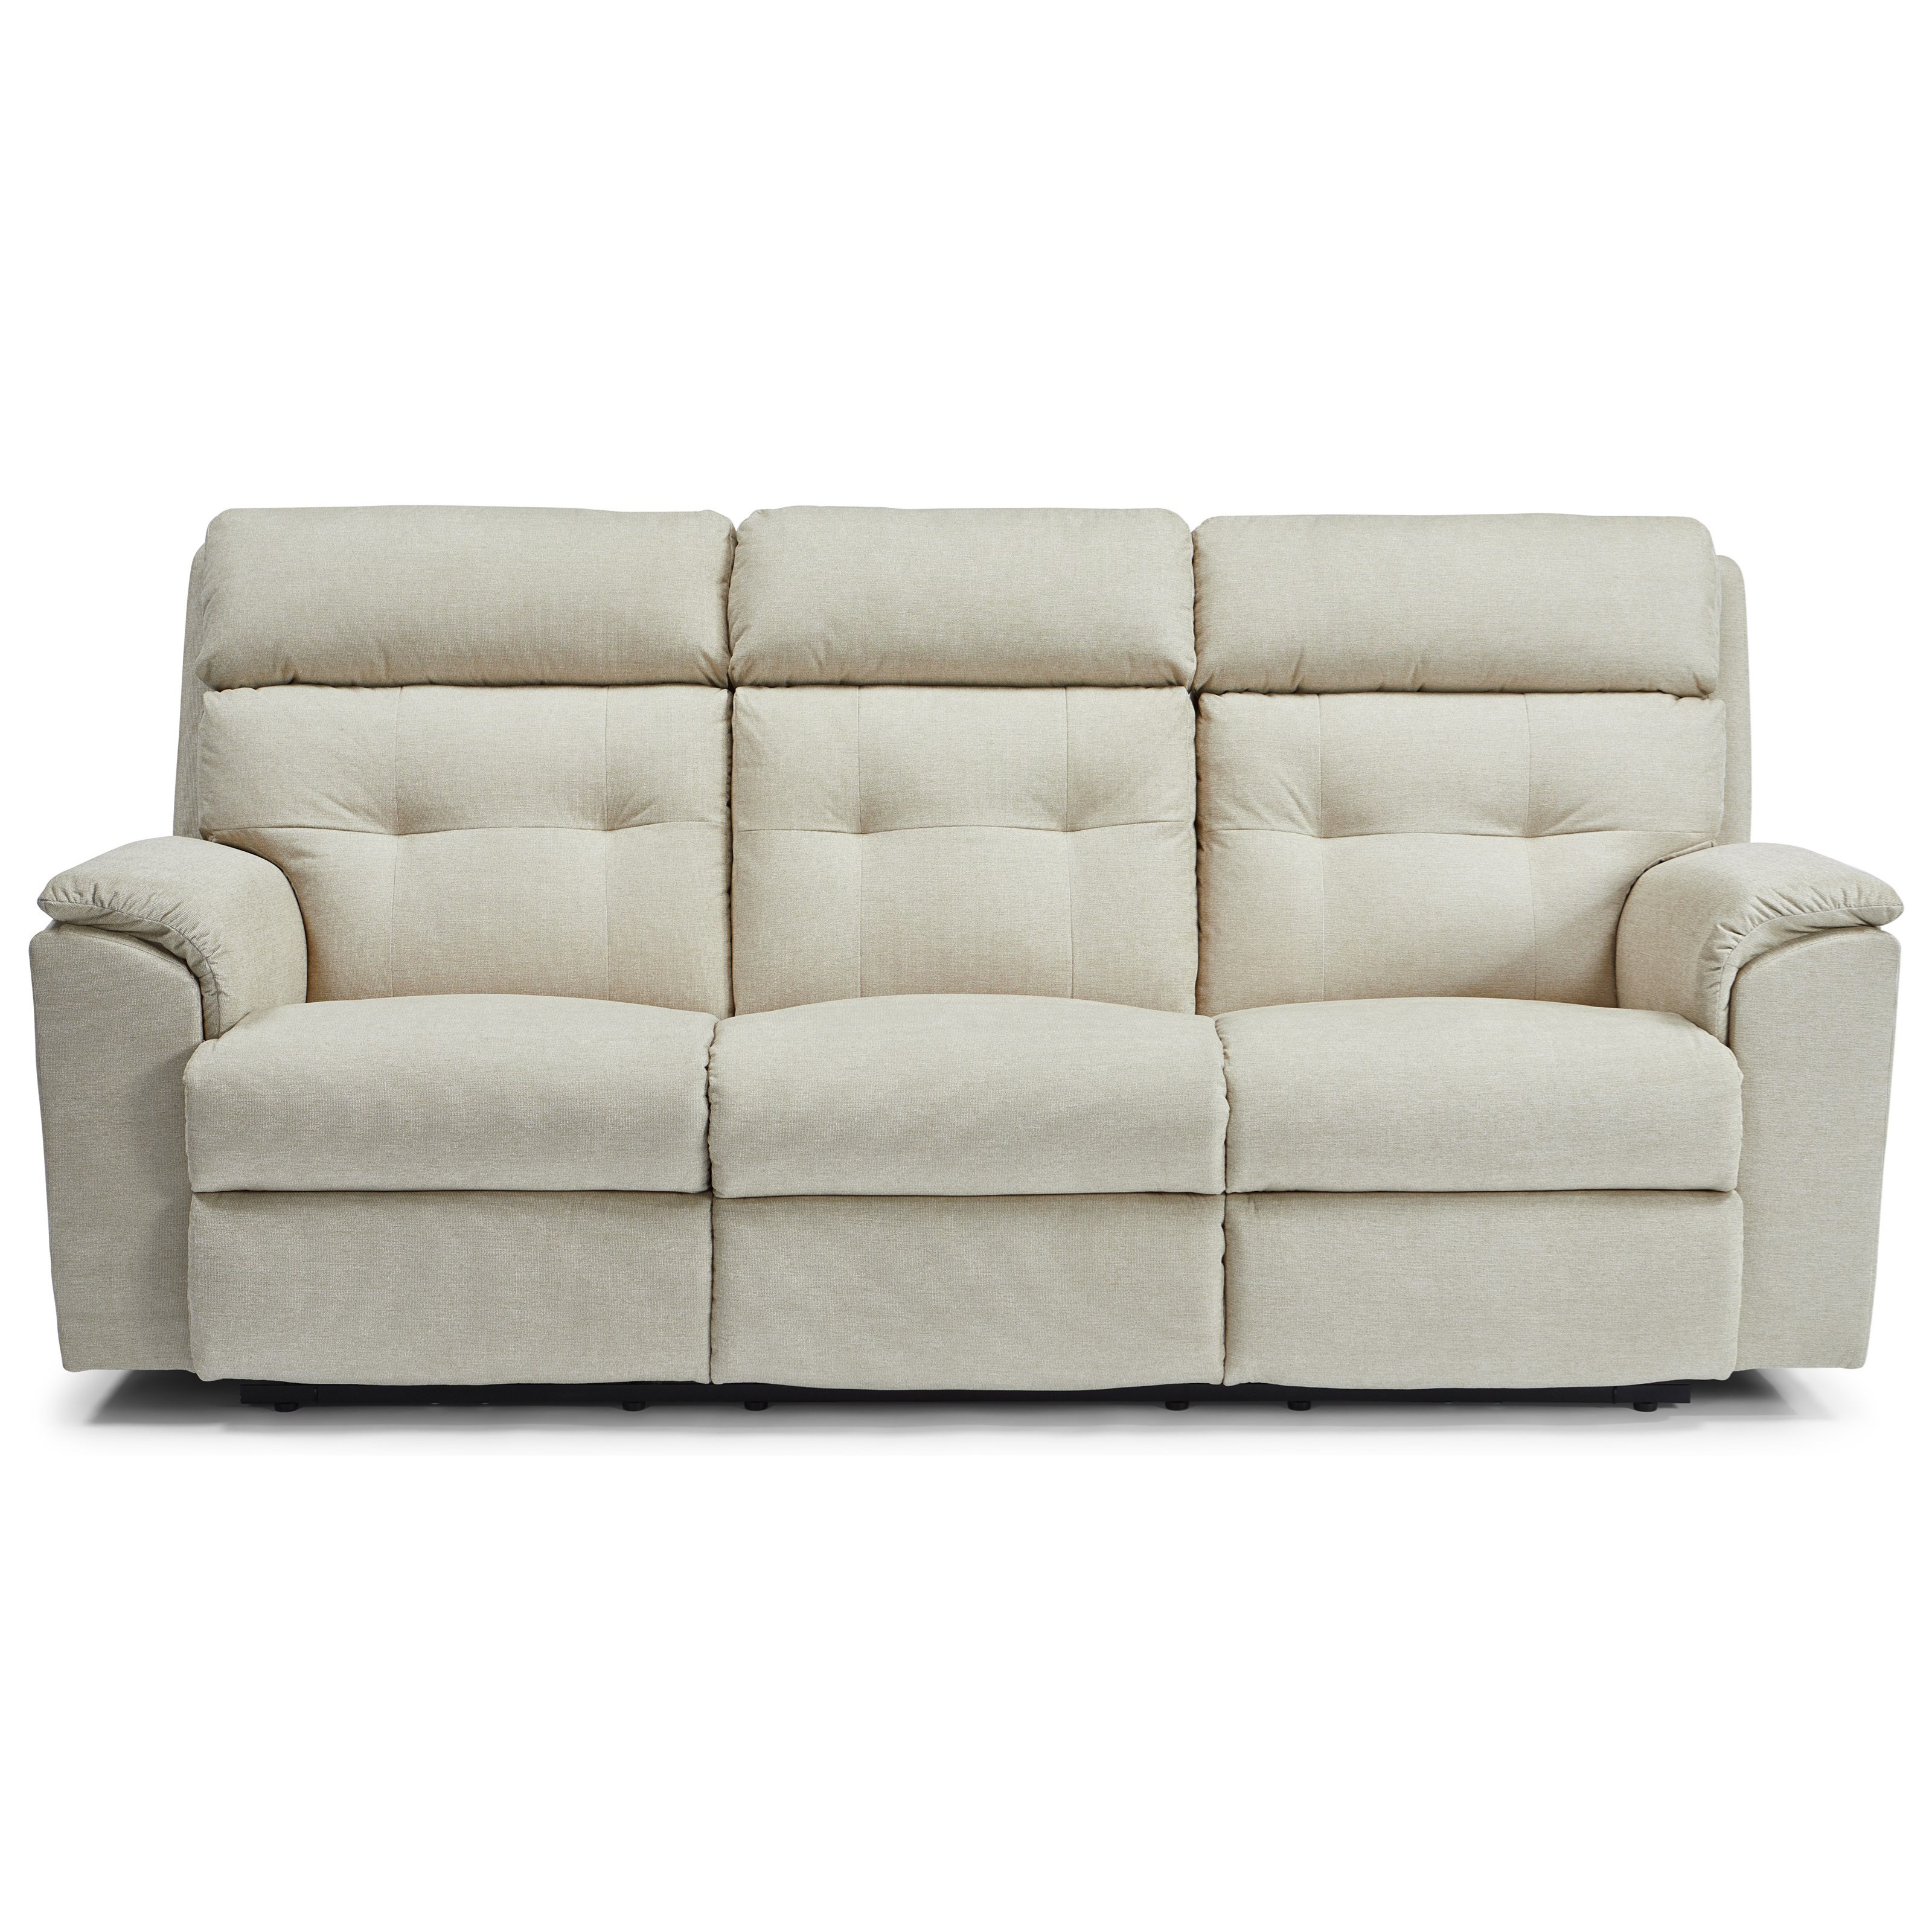 Mason Reclining Sofa by Flexsteel at Steger's Furniture